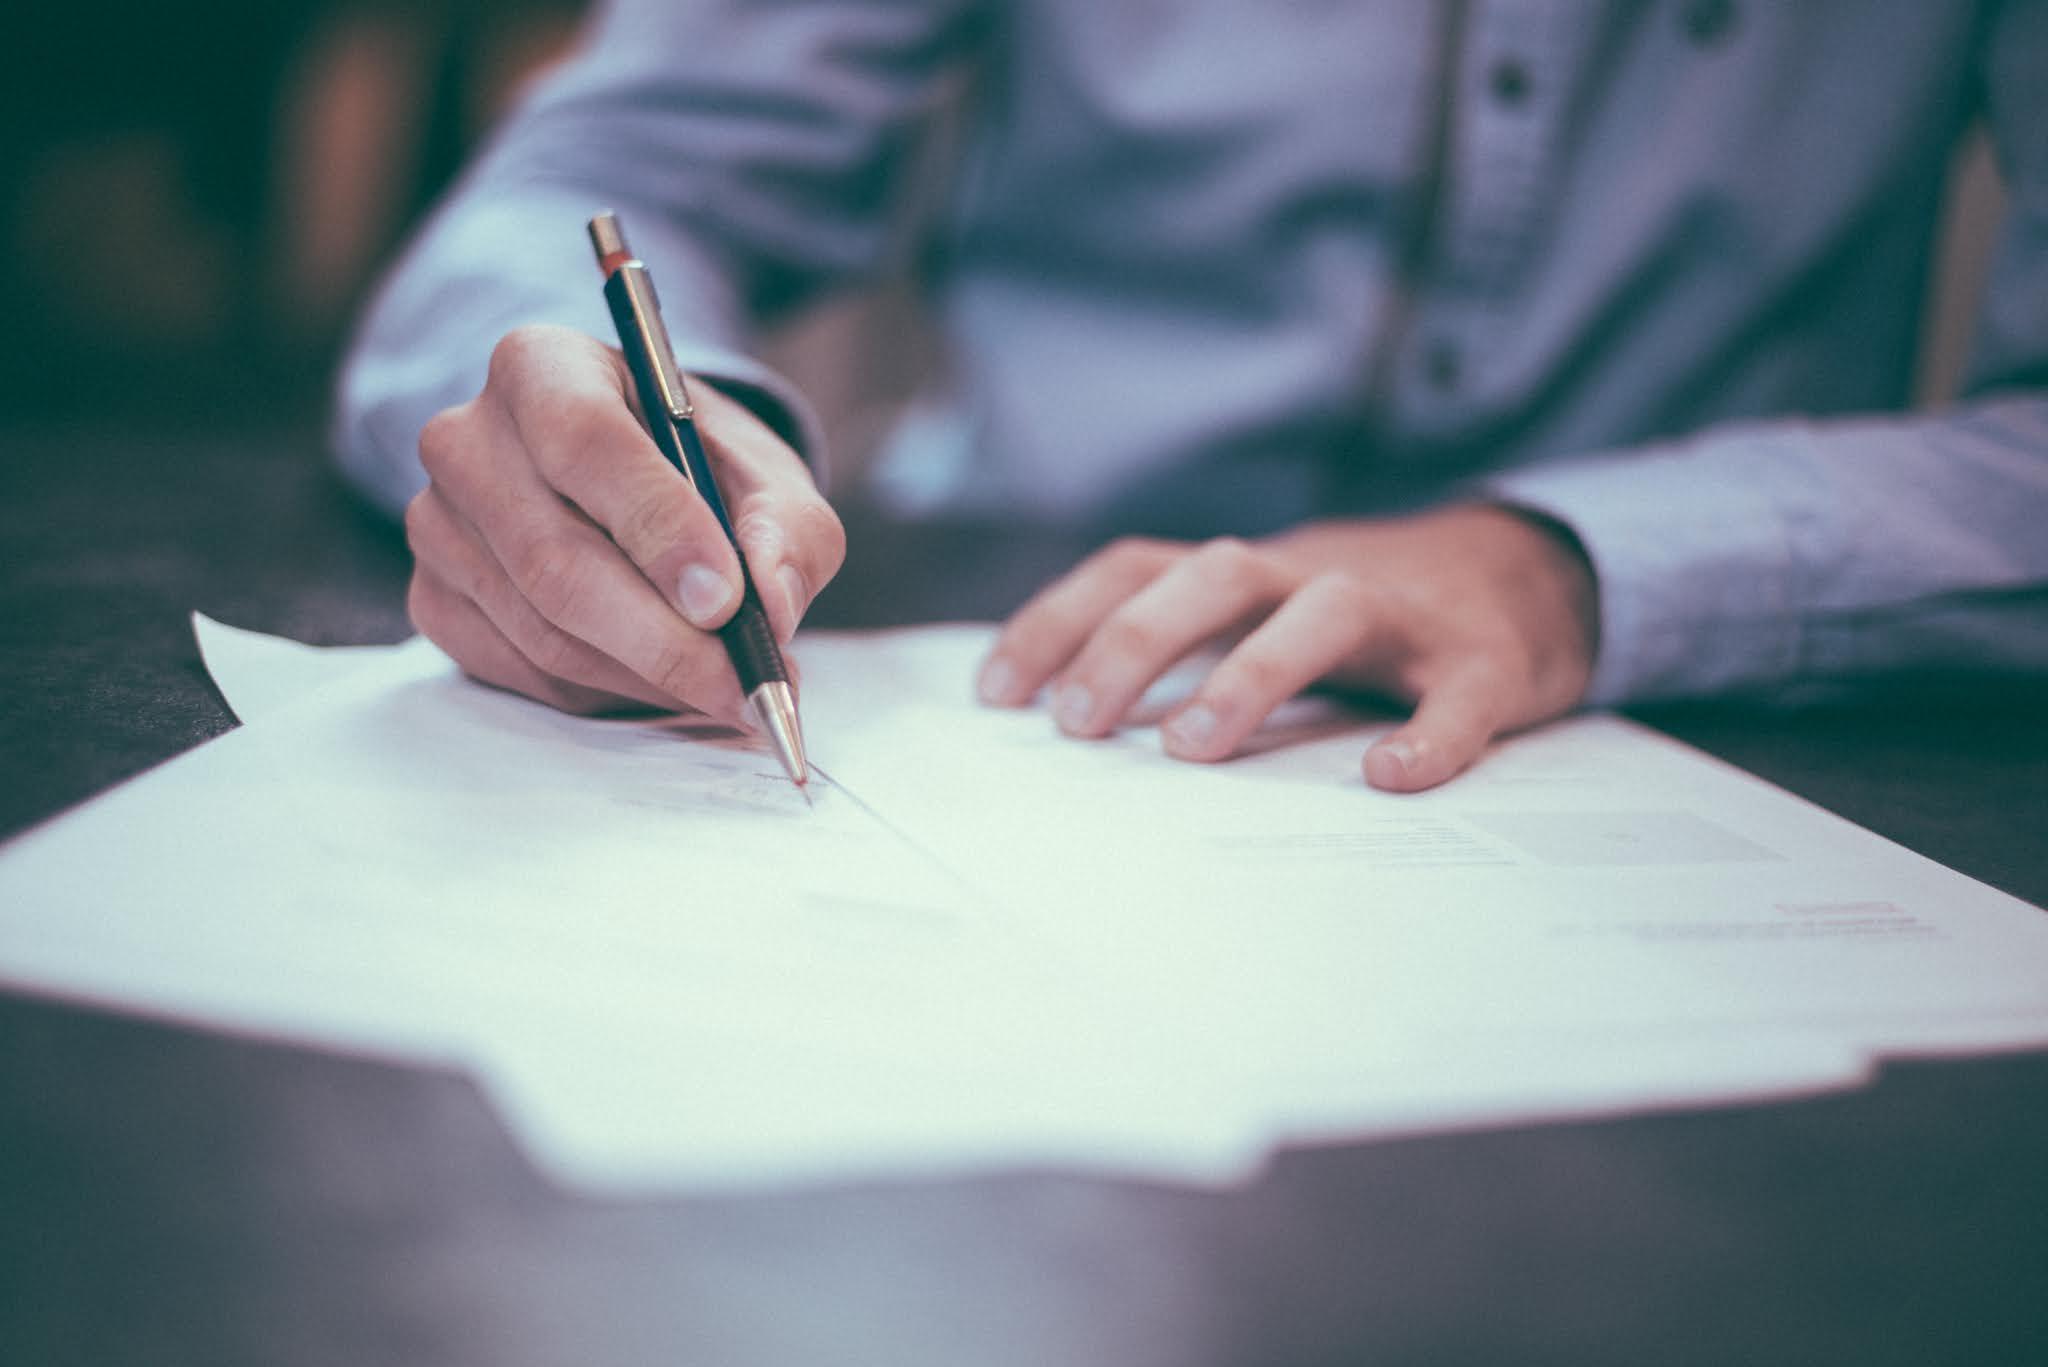 15 Doubts You Should Clarify About Insurance